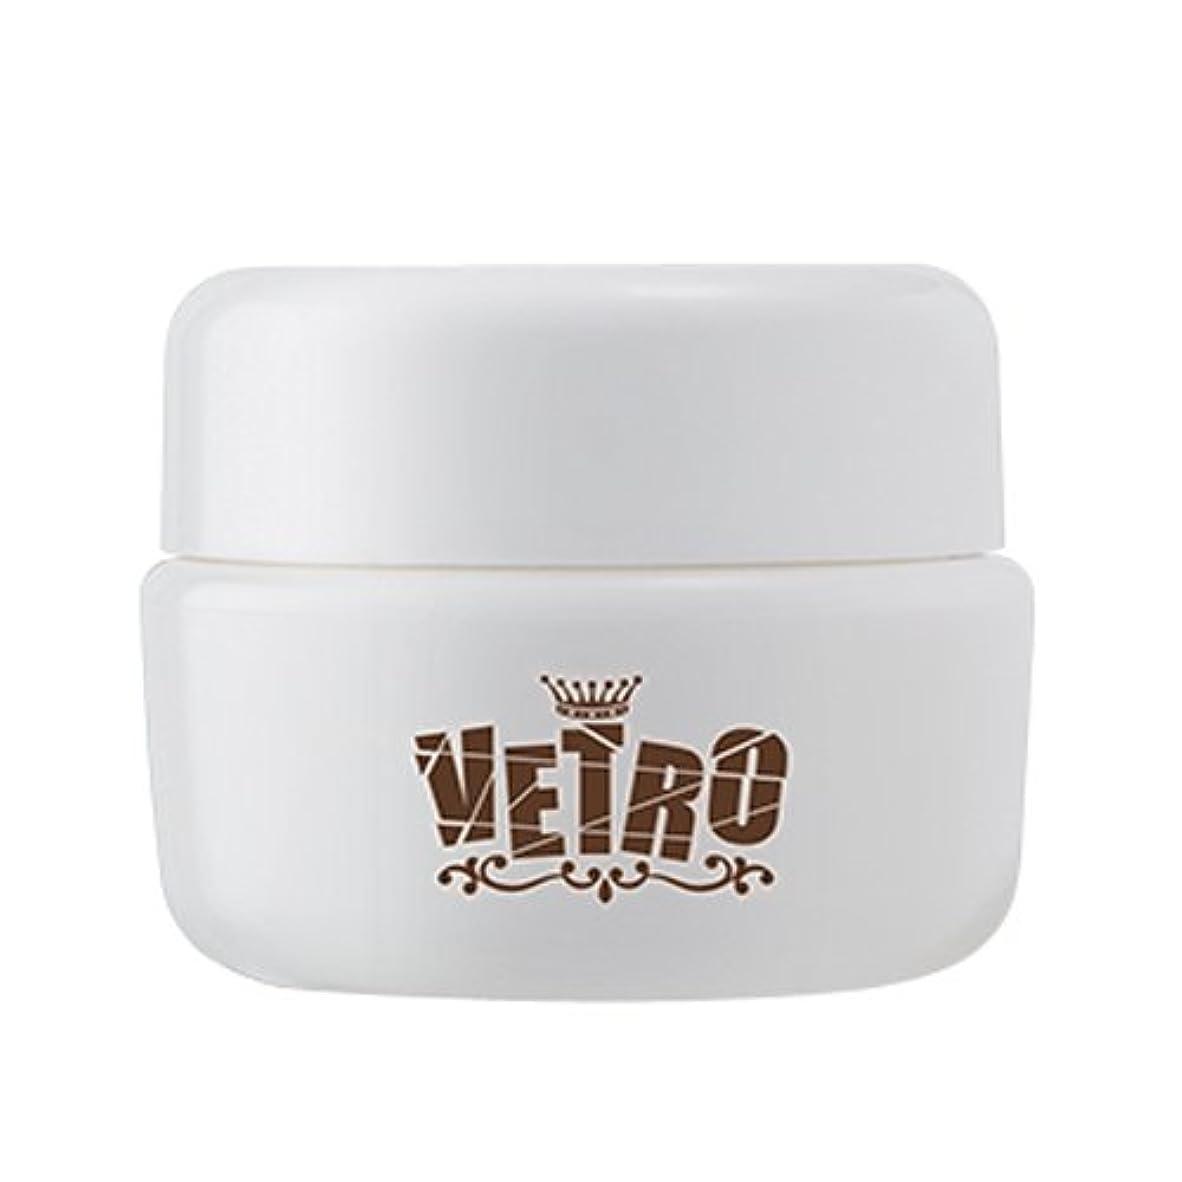 VETRO ベトロ NO.19 カラージェル 4ml VL026オレンジ